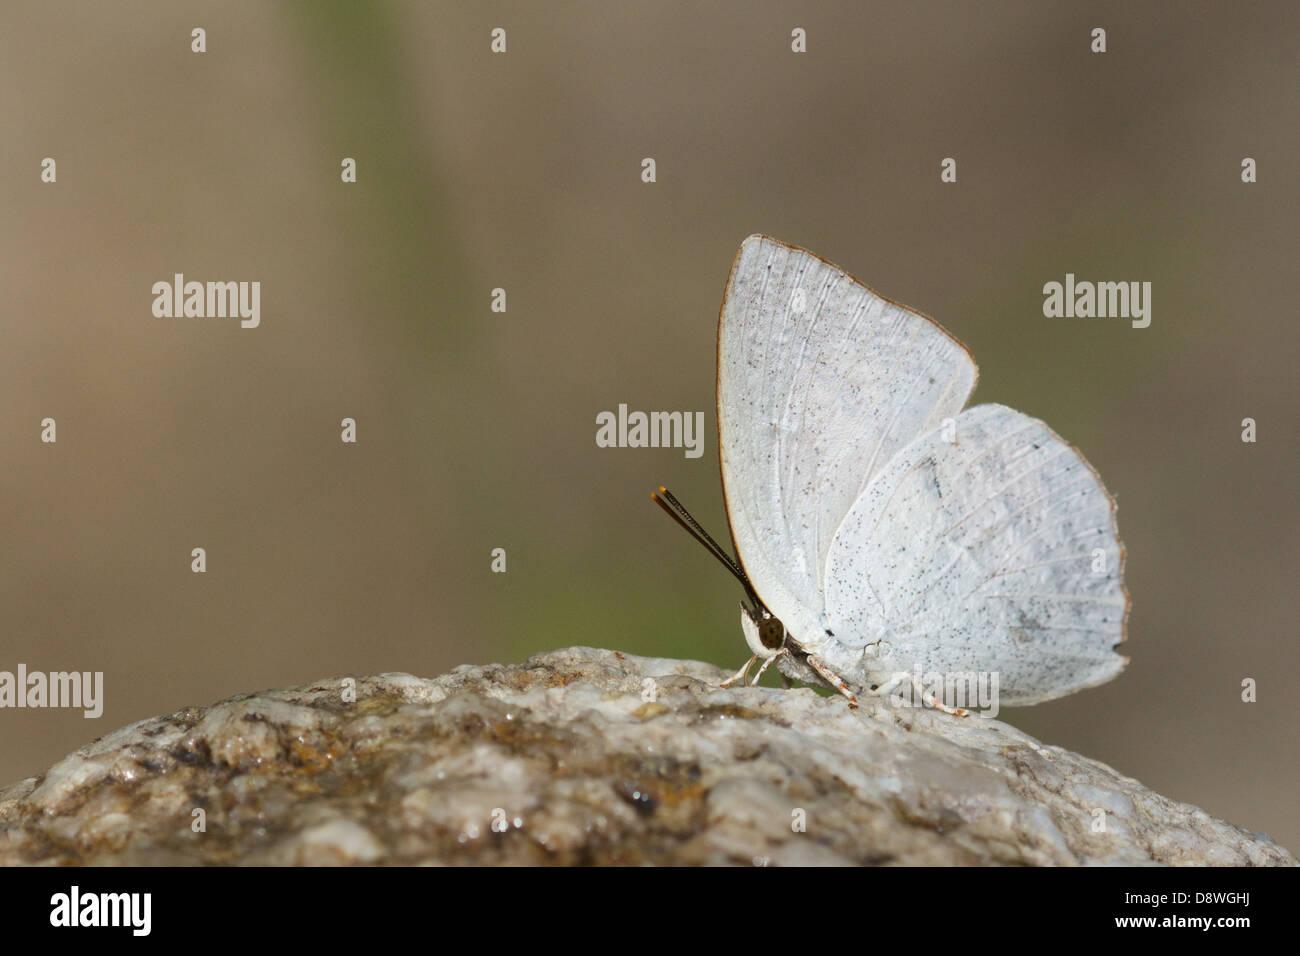 The Malayan Sunbeam, Curetis santana malayica. Chaloem Phrakiat Thai Prachan National Park, Thailand. - Stock Image